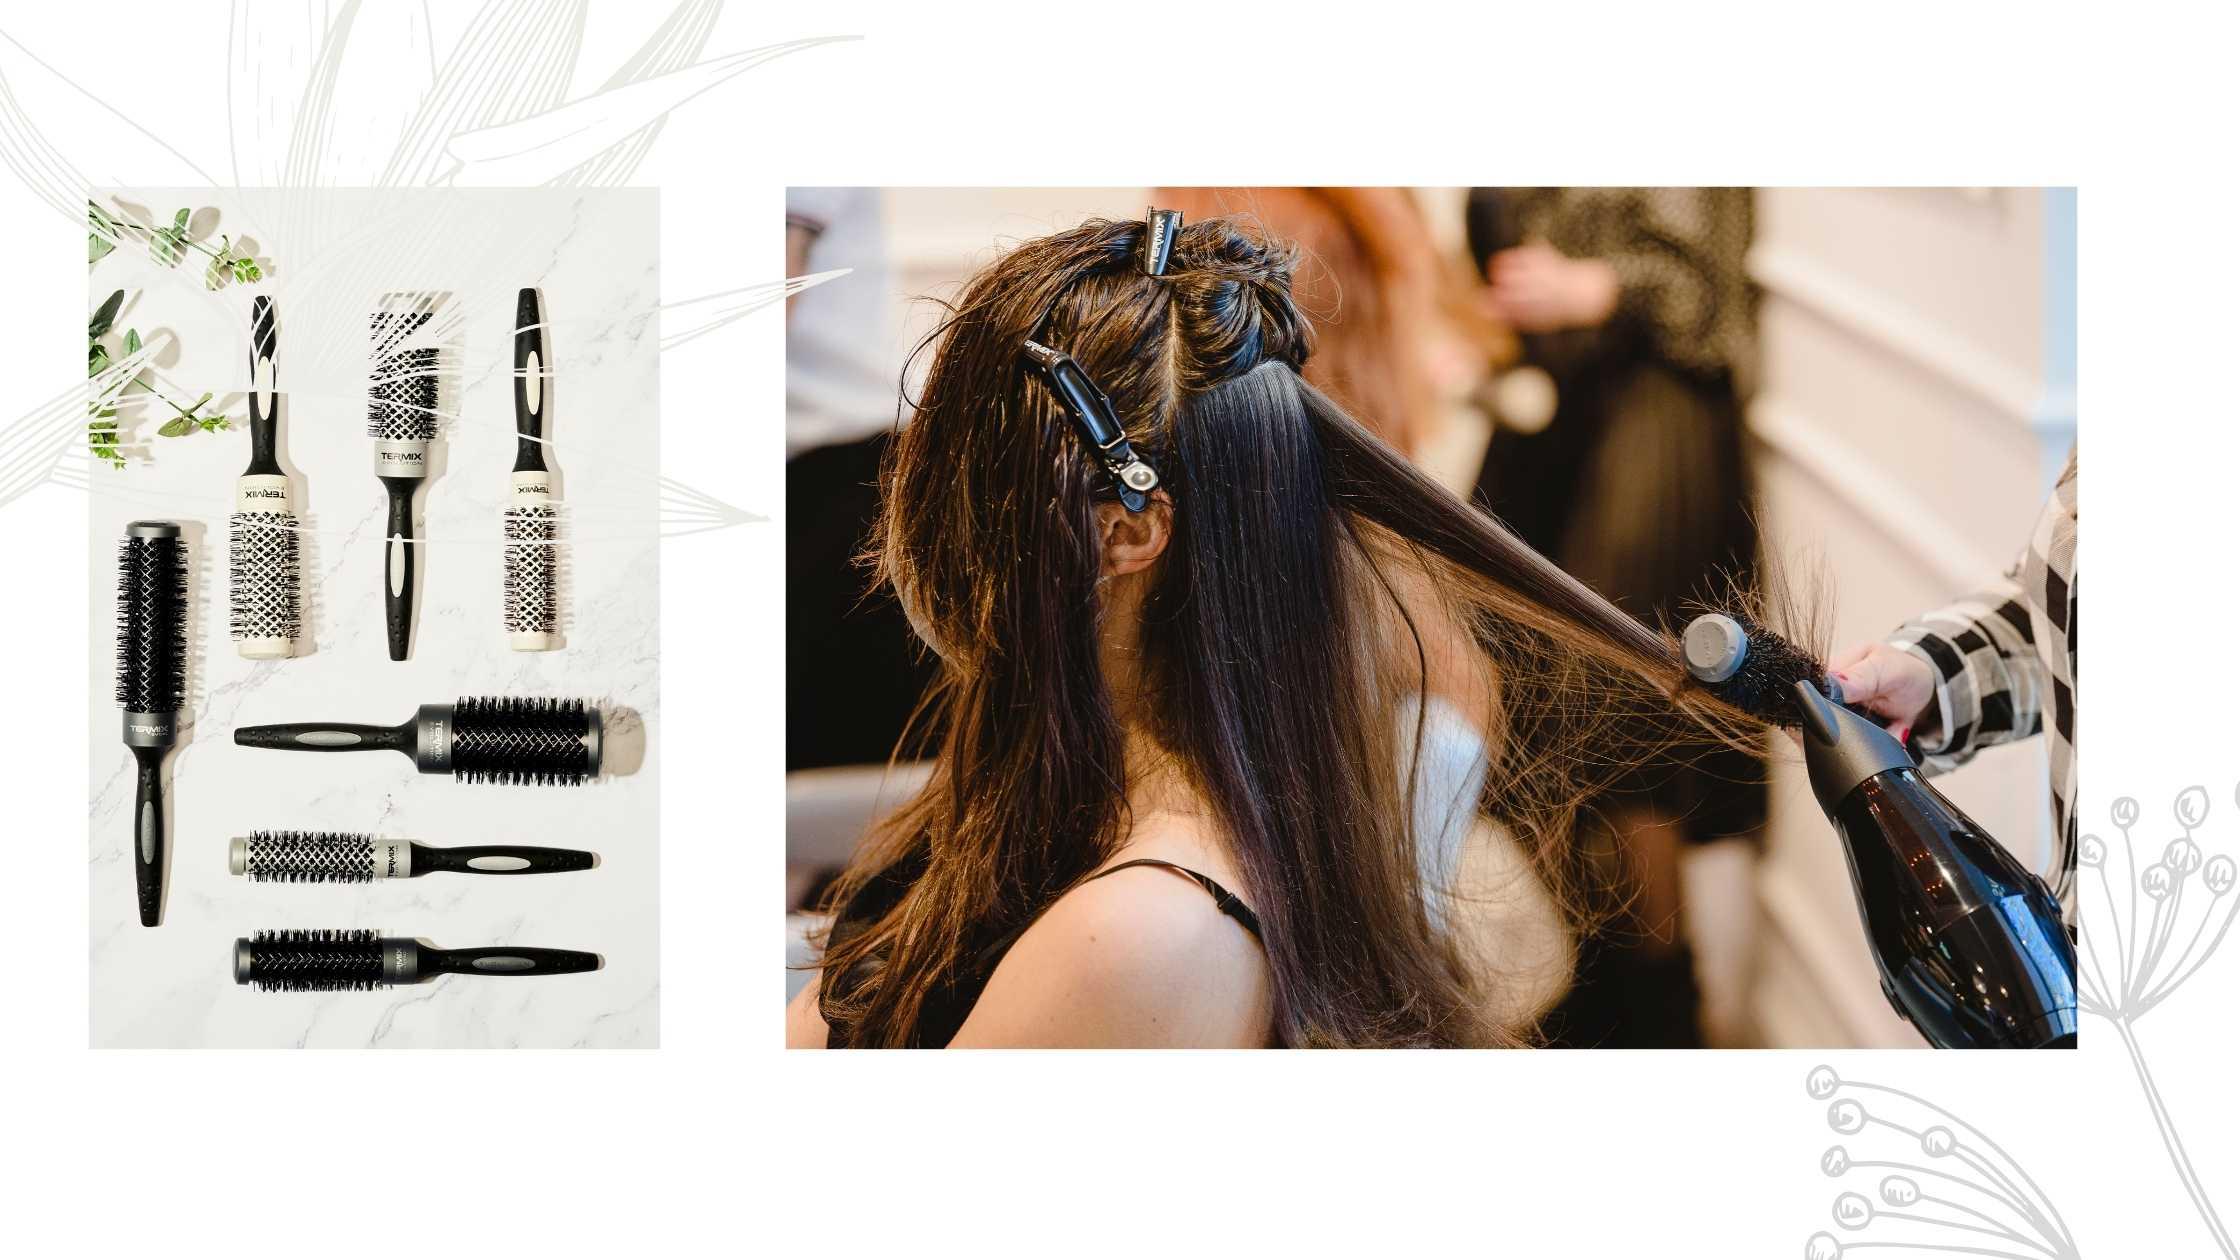 Elige el cepillo adecuado segun tu tipo de cabello